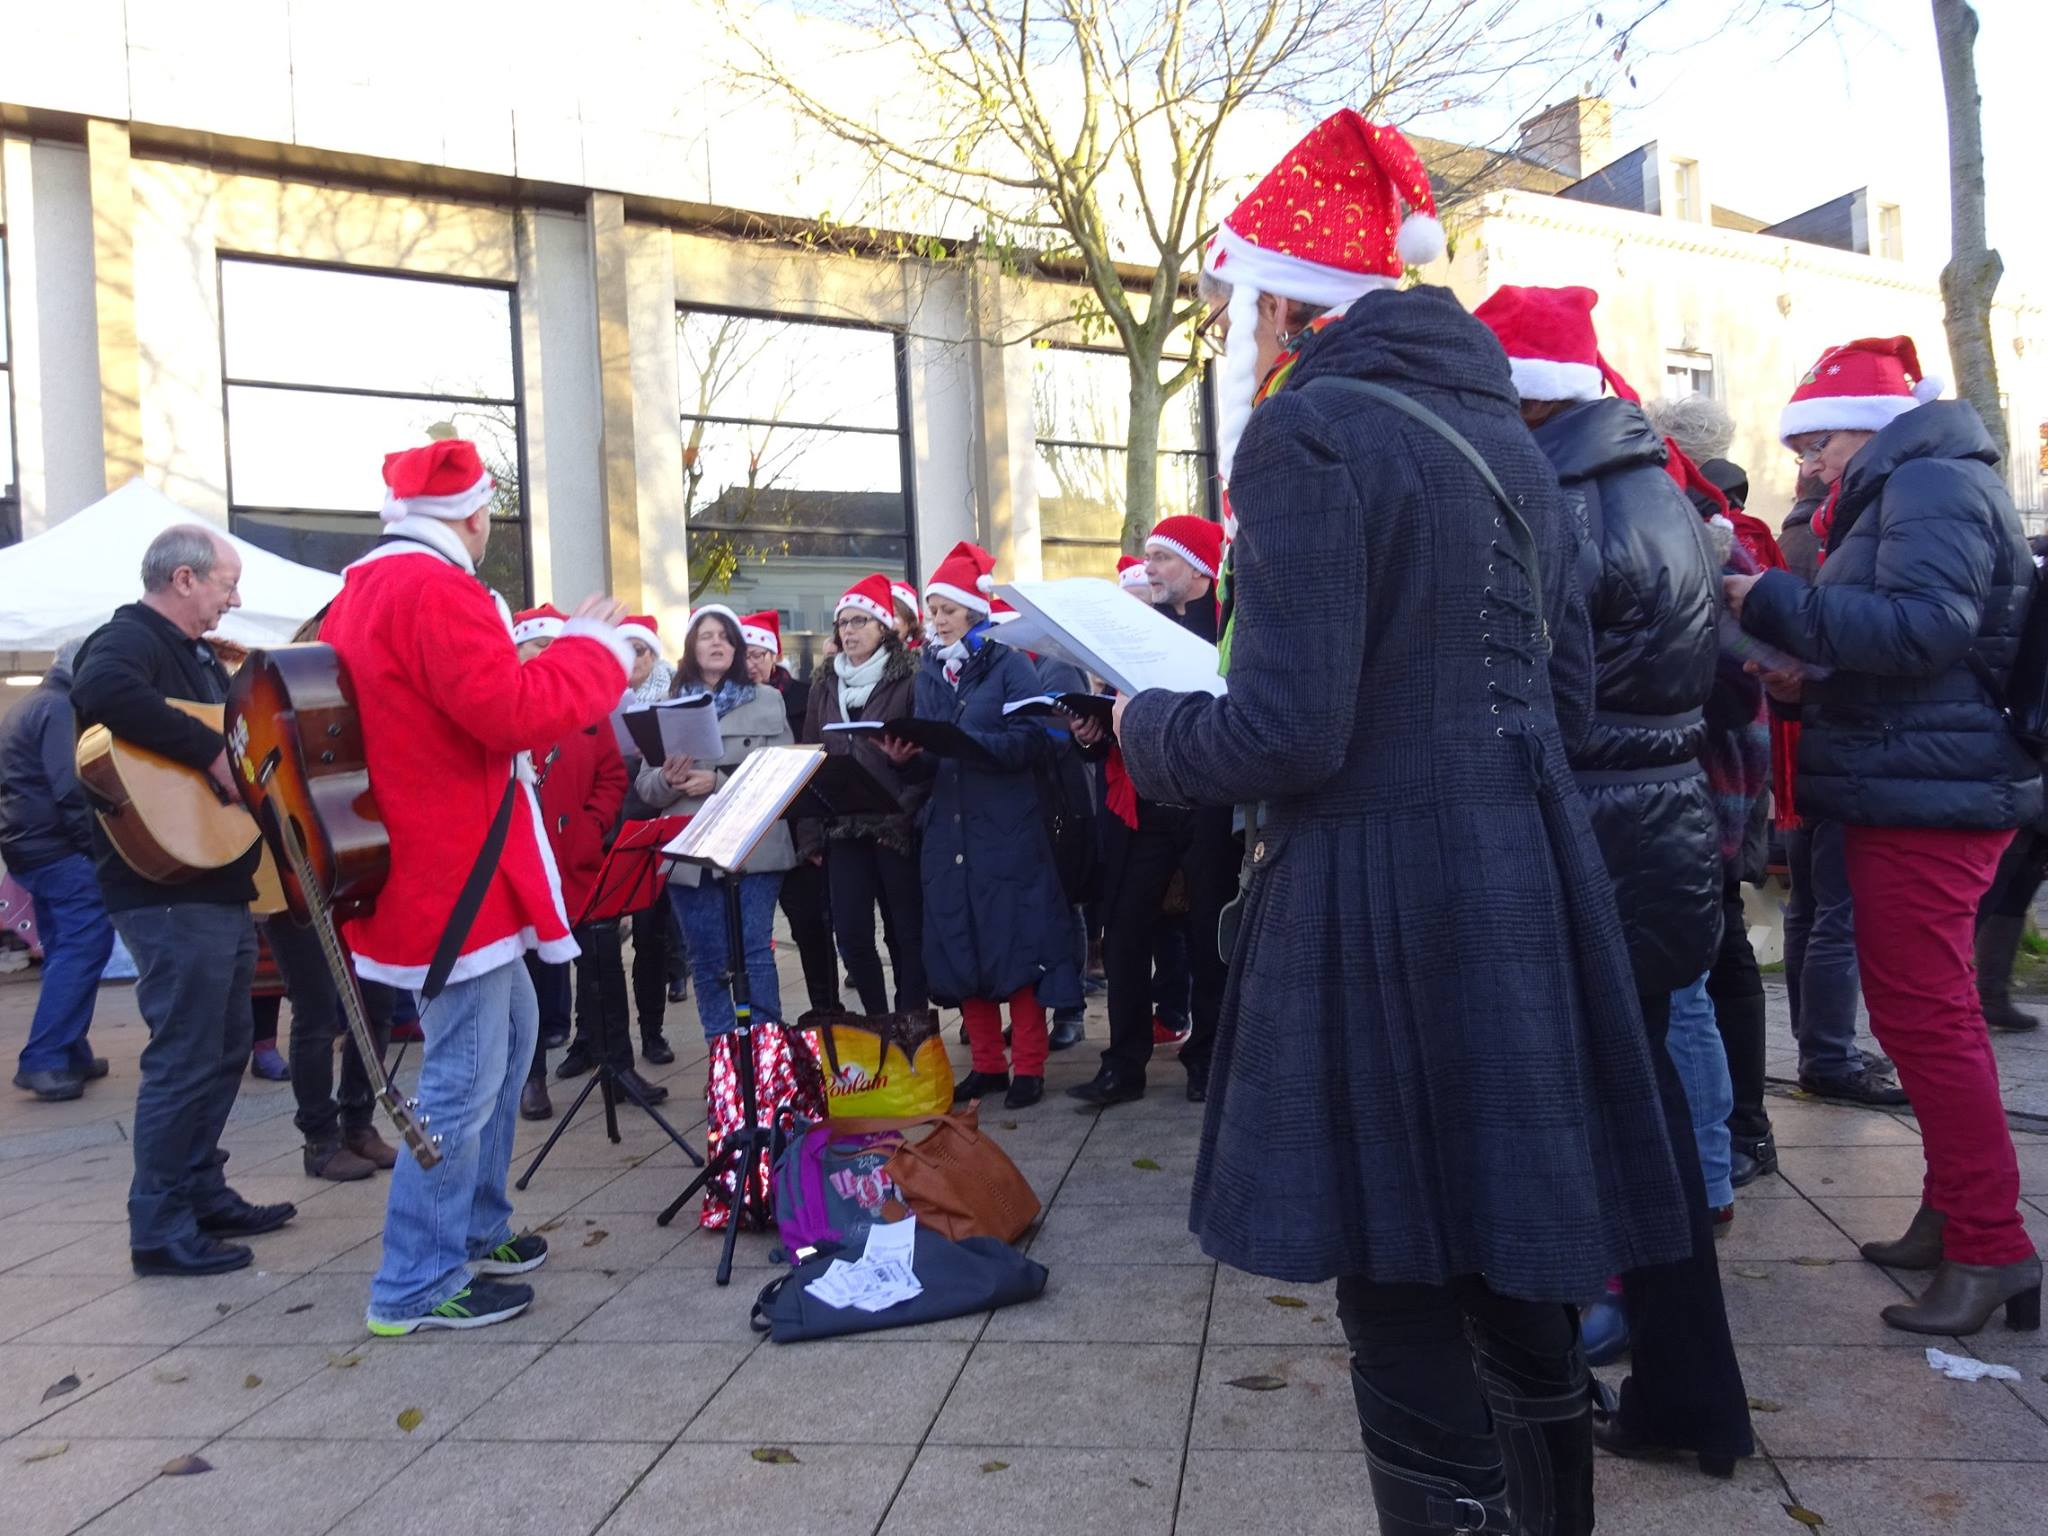 2015-12-12 – Au marché de Noël (4) Sabrina